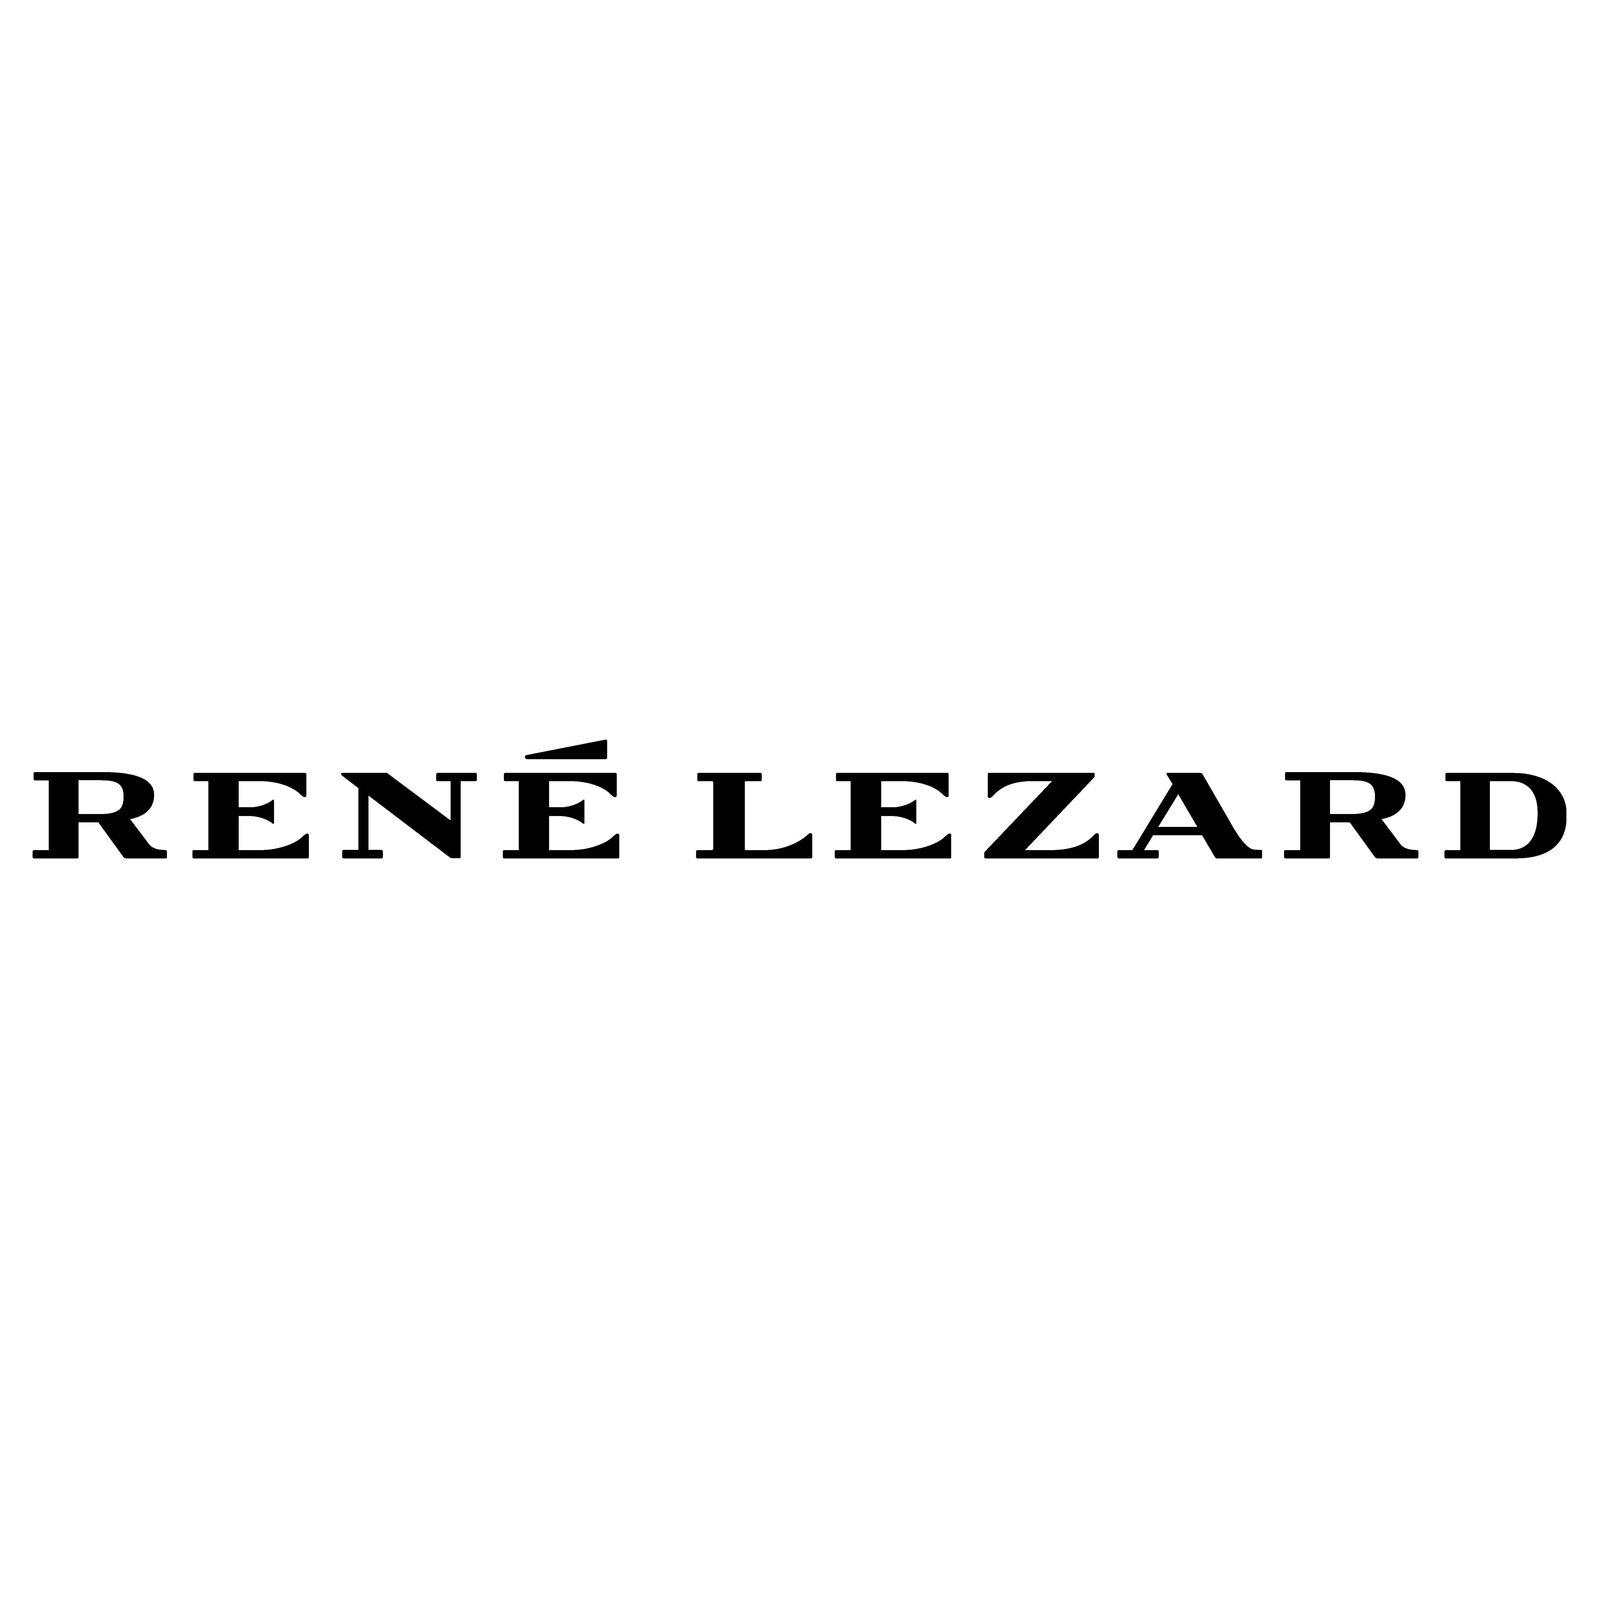 RENÉ LEZARD (Bild 1)